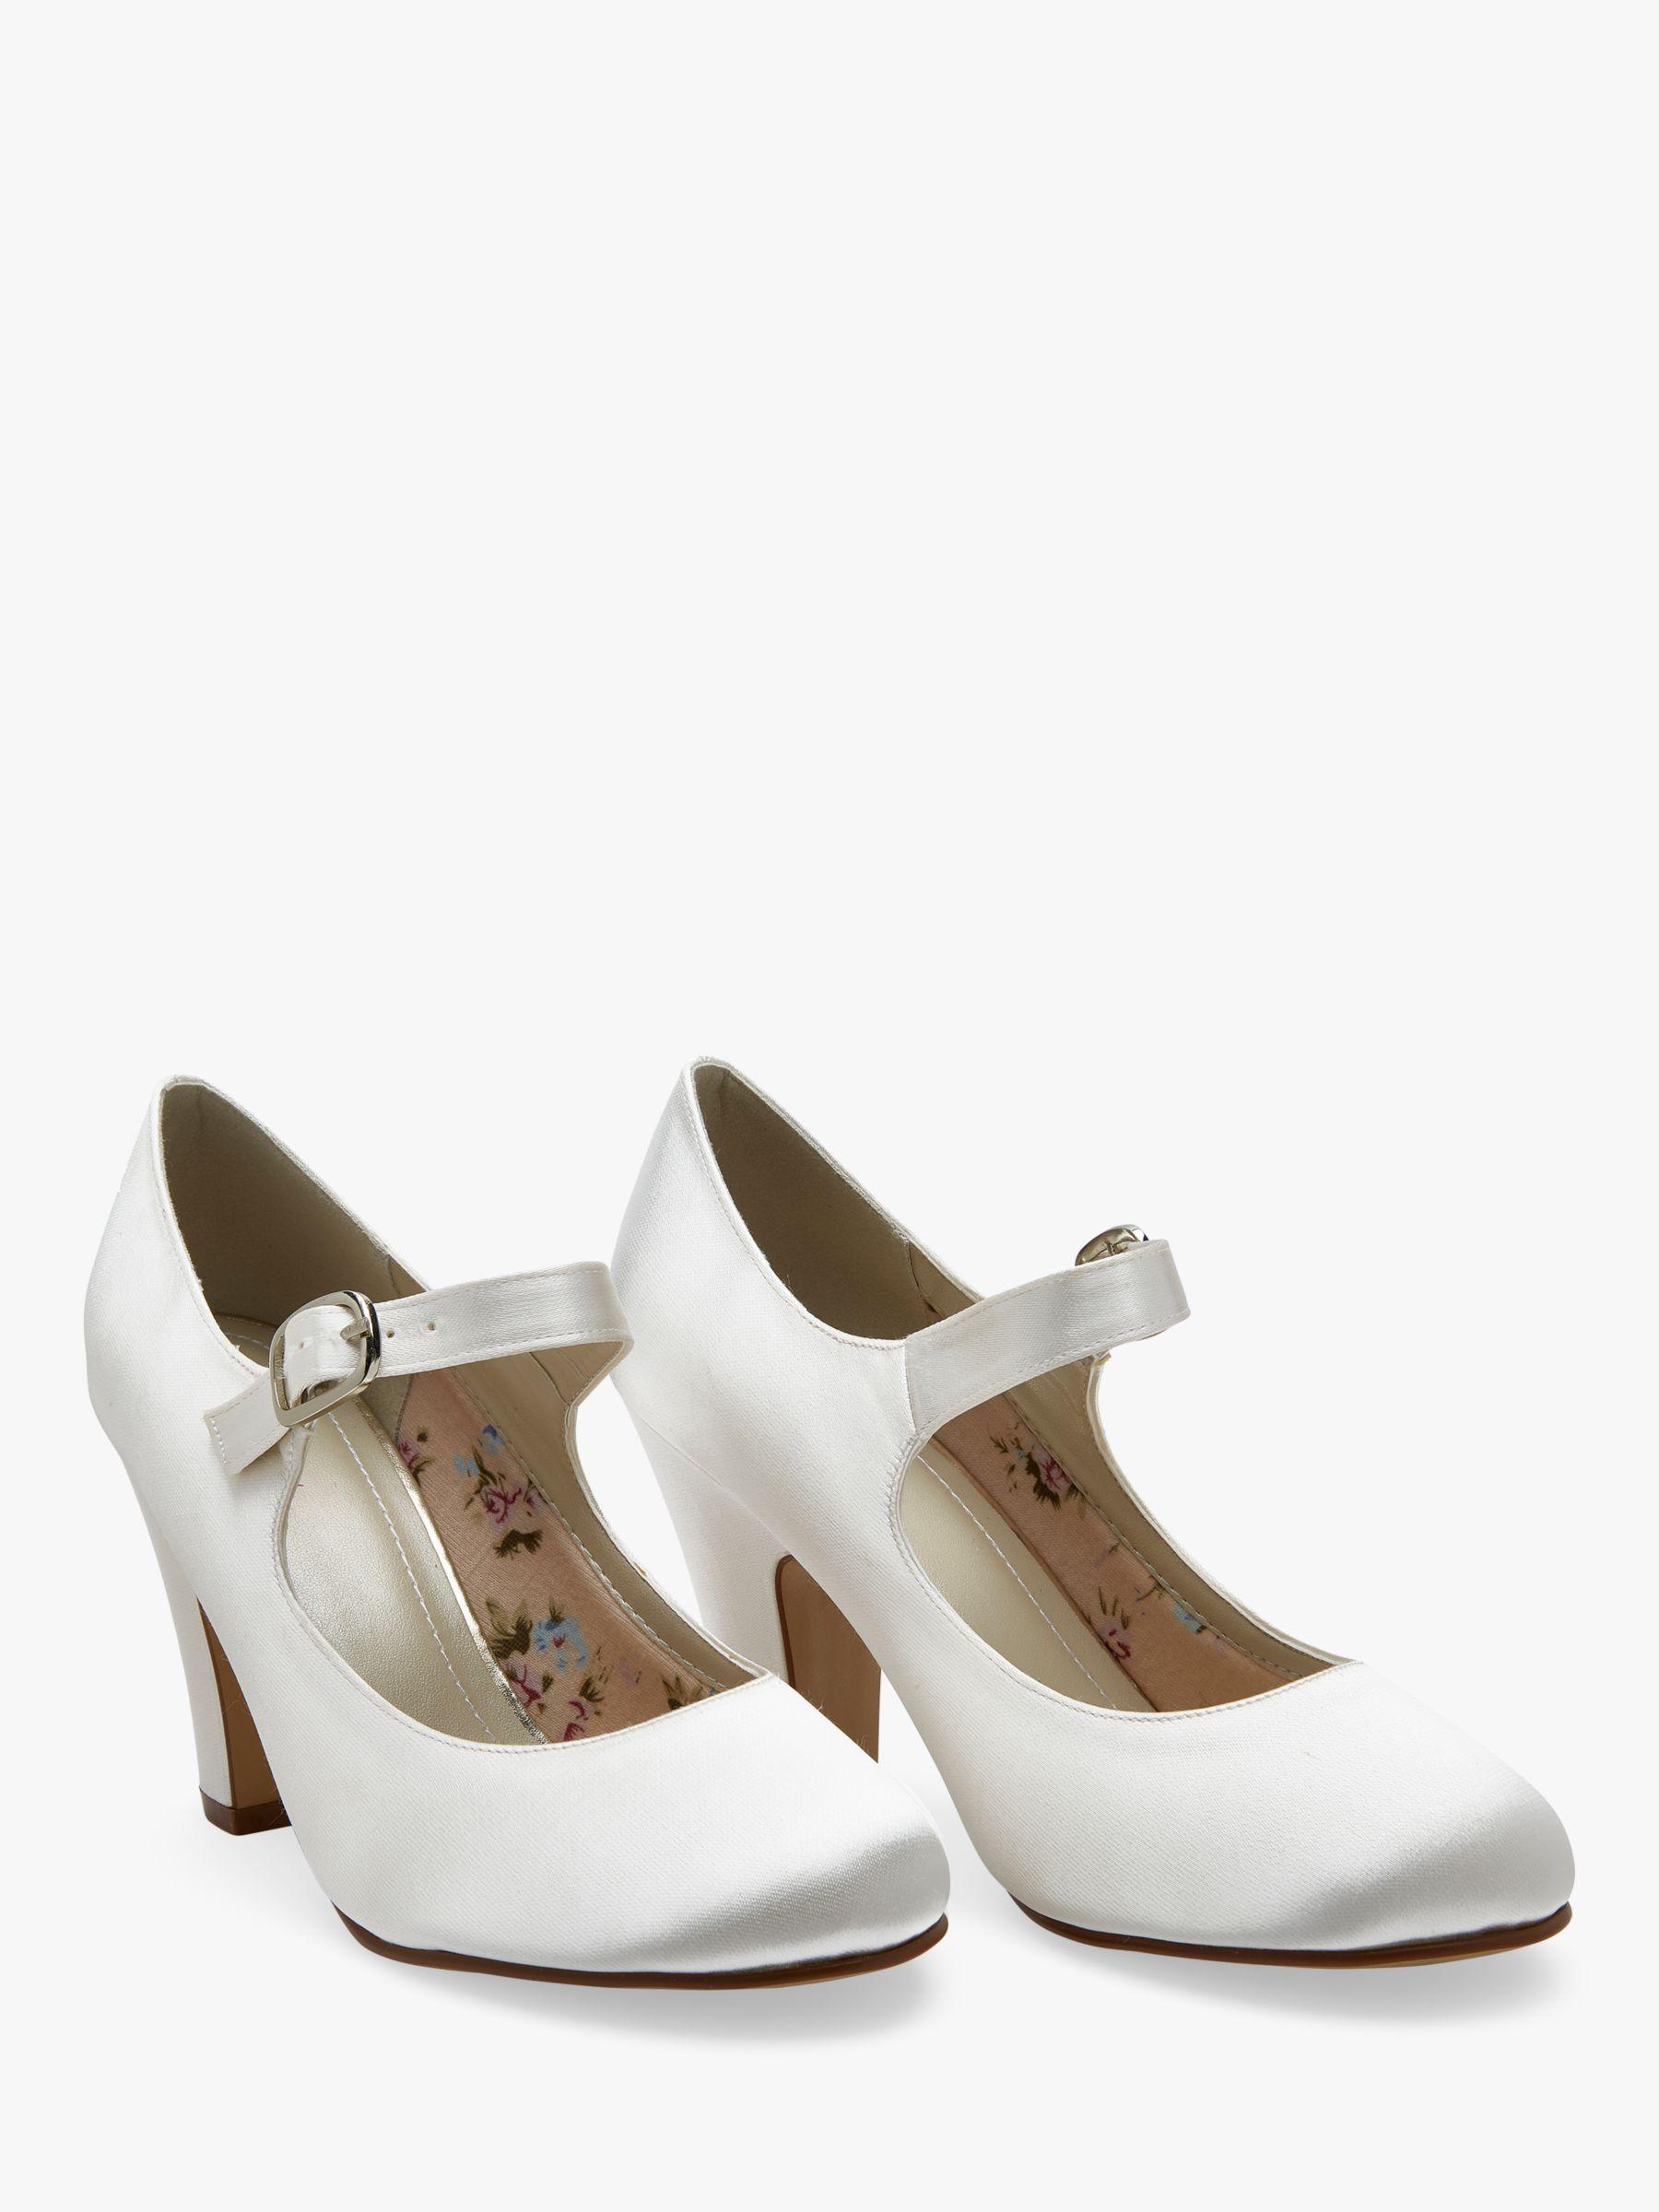 ecco shoes john lewis